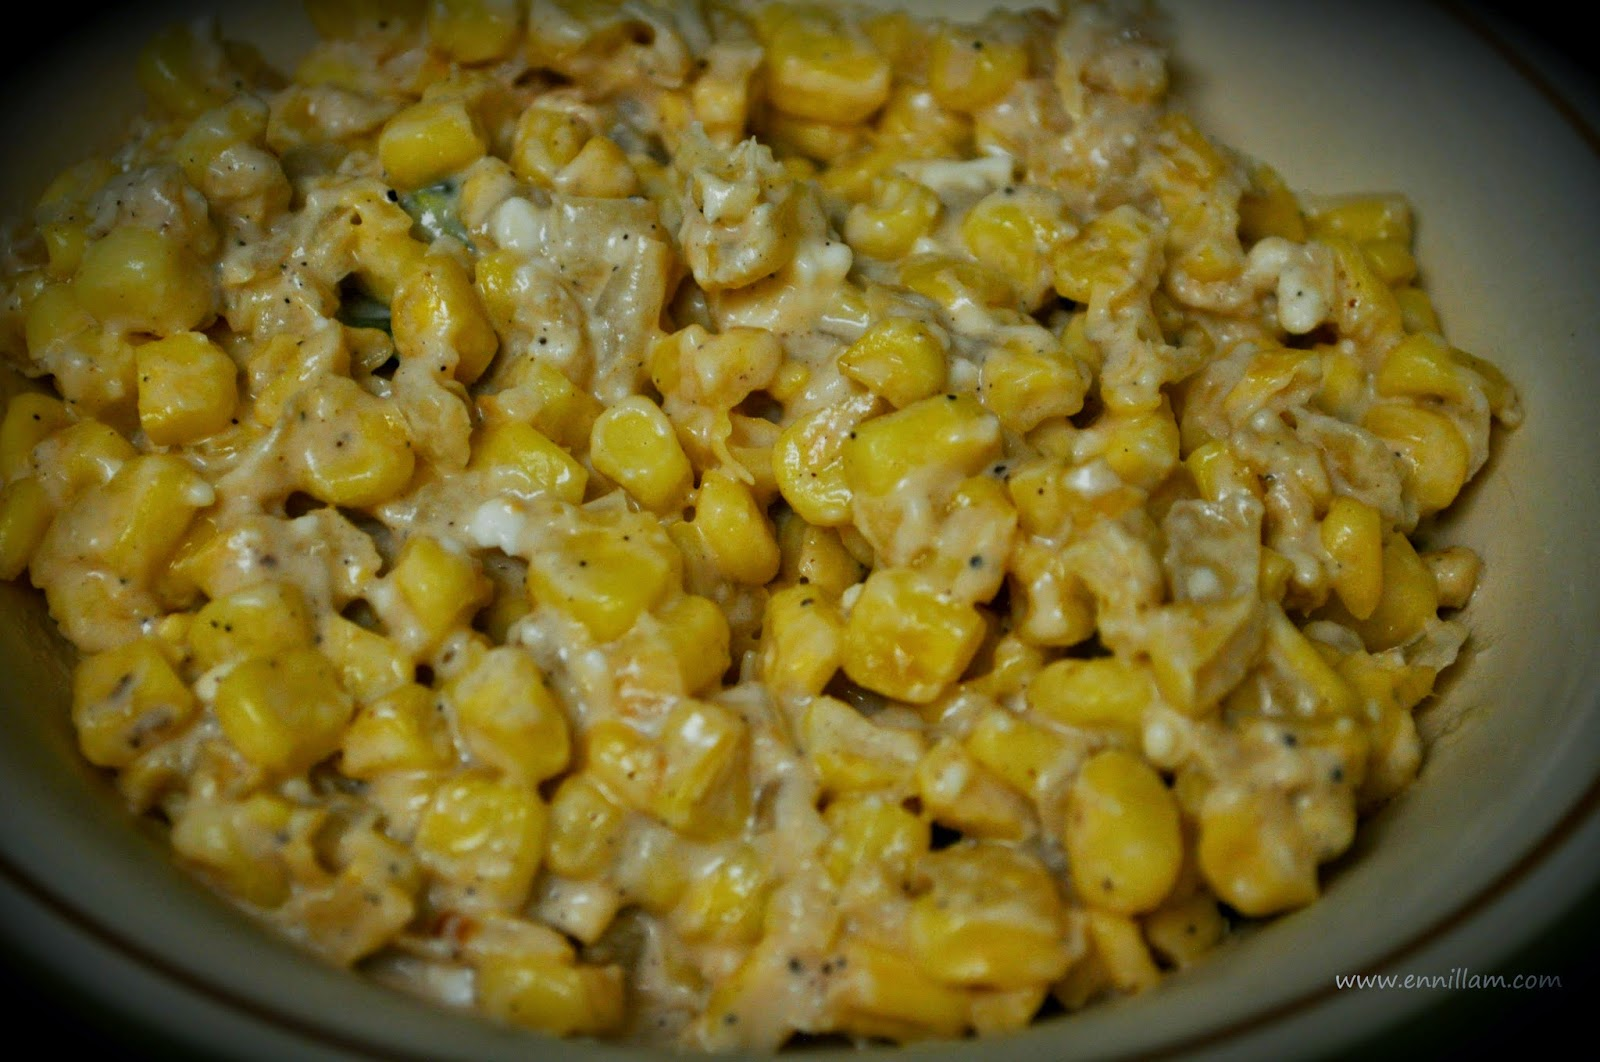 Creamy corn stir fry